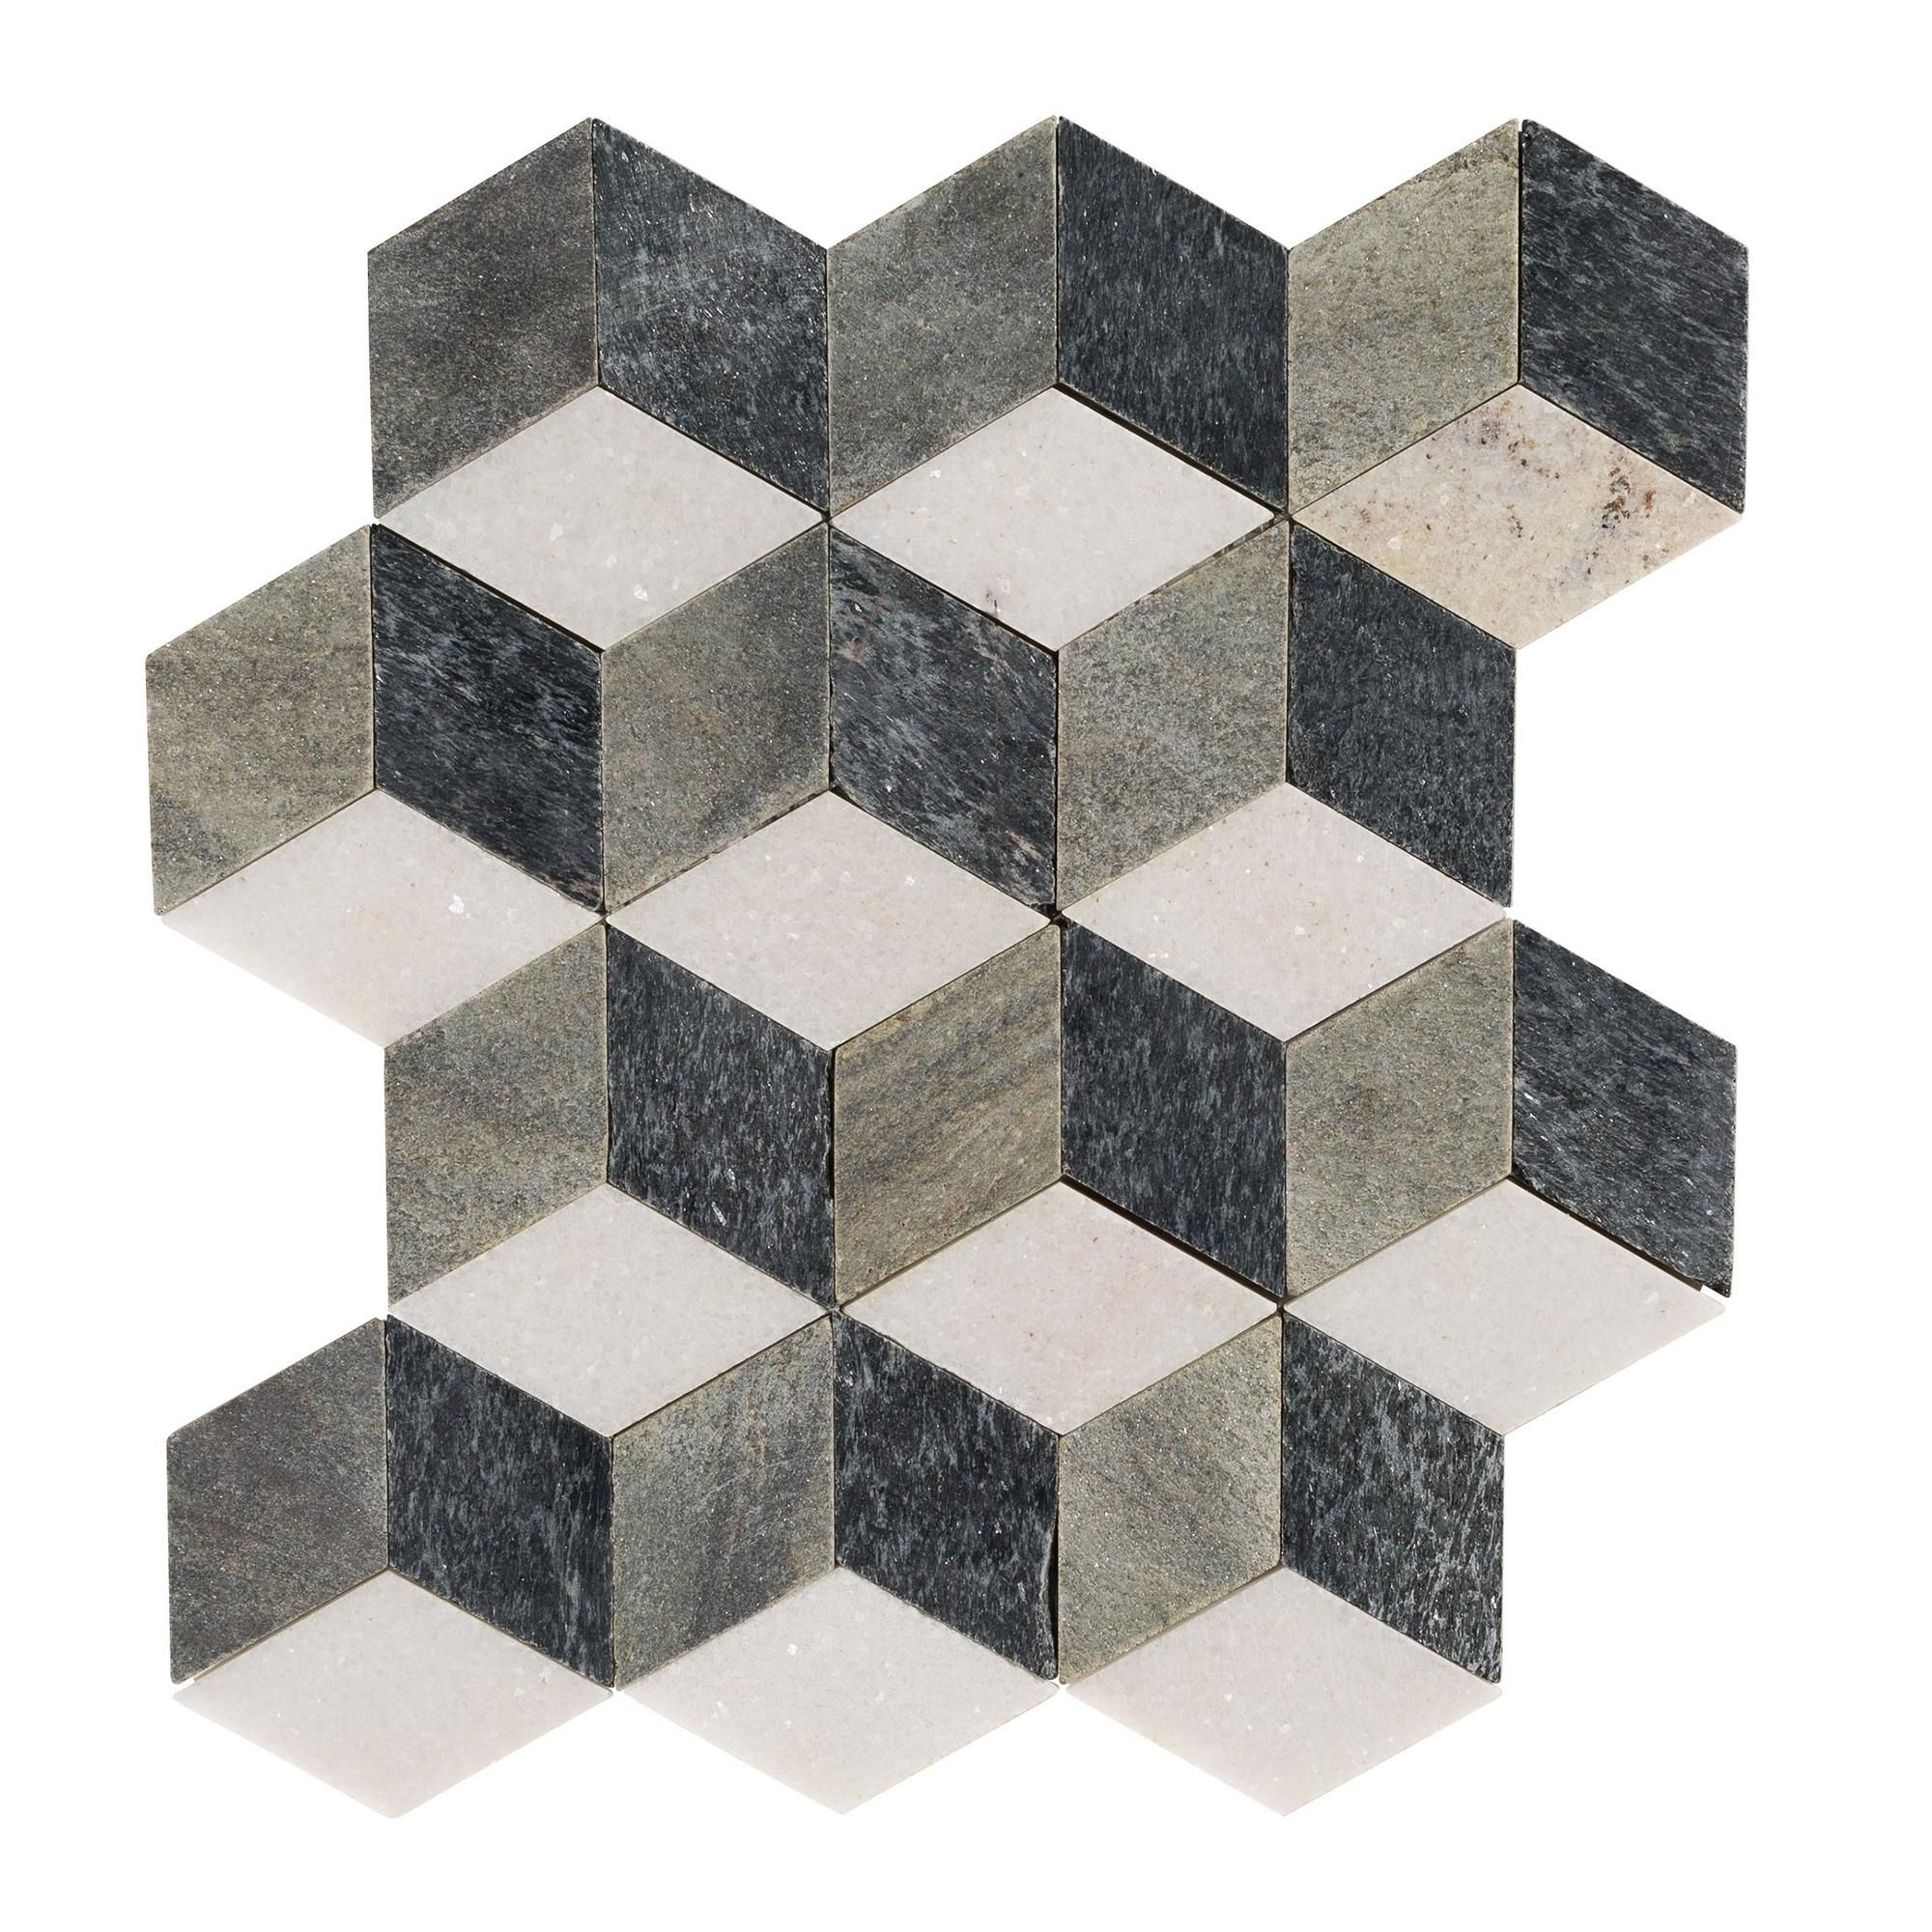 White And Black Dot Octagonal Ii Porcelain Mosaic Floor Decor In 2020 Porcelain Mosaic Black And White Tiles Mosaic Flooring